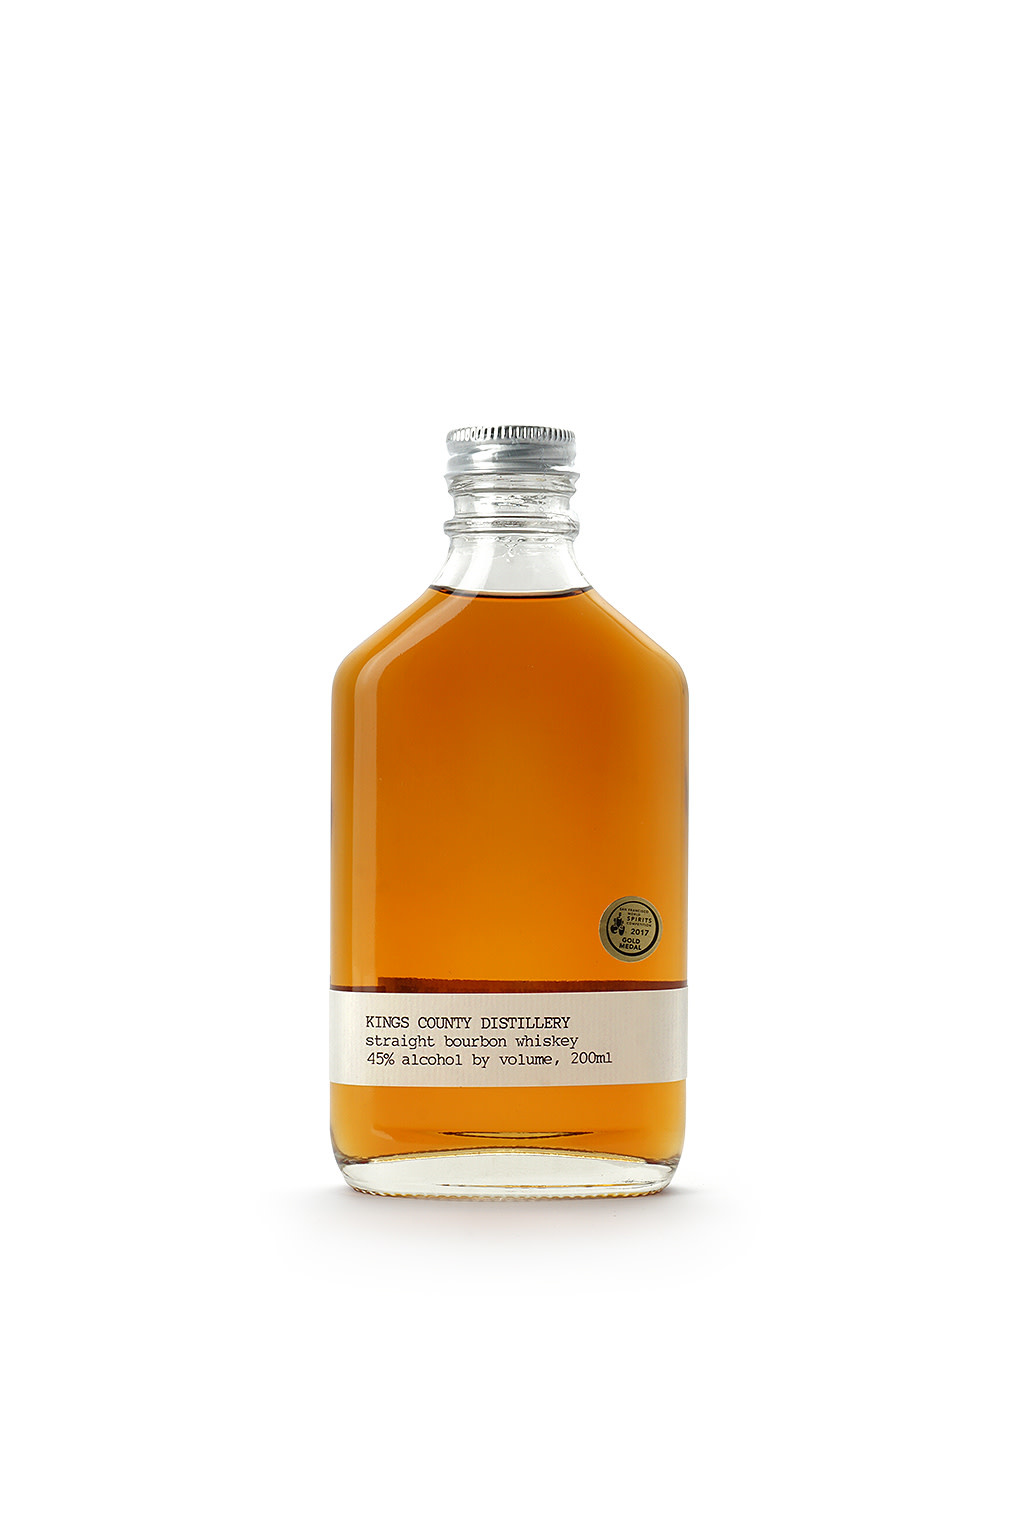 Kings County Distillery Straight Bourbon 200ml